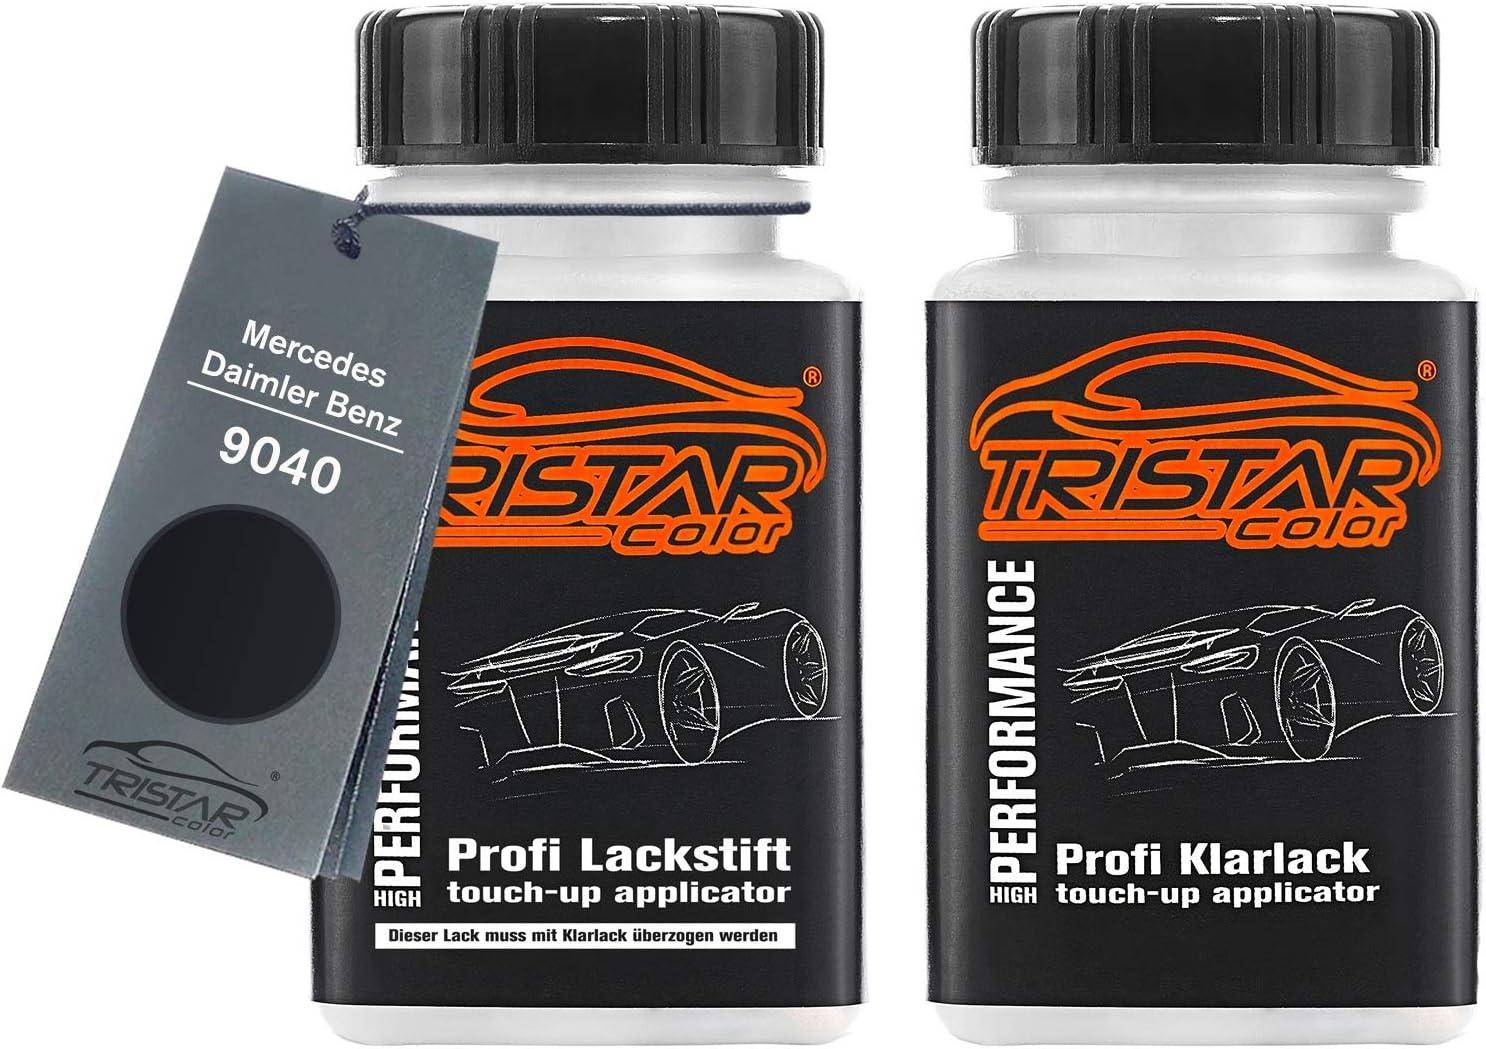 Tristarcolor Autolack Lackstift Set Für Mercedes Daimler Benz 9040 Tiefschwarz Deep Black Basislack Klarlack Je 50ml Auto